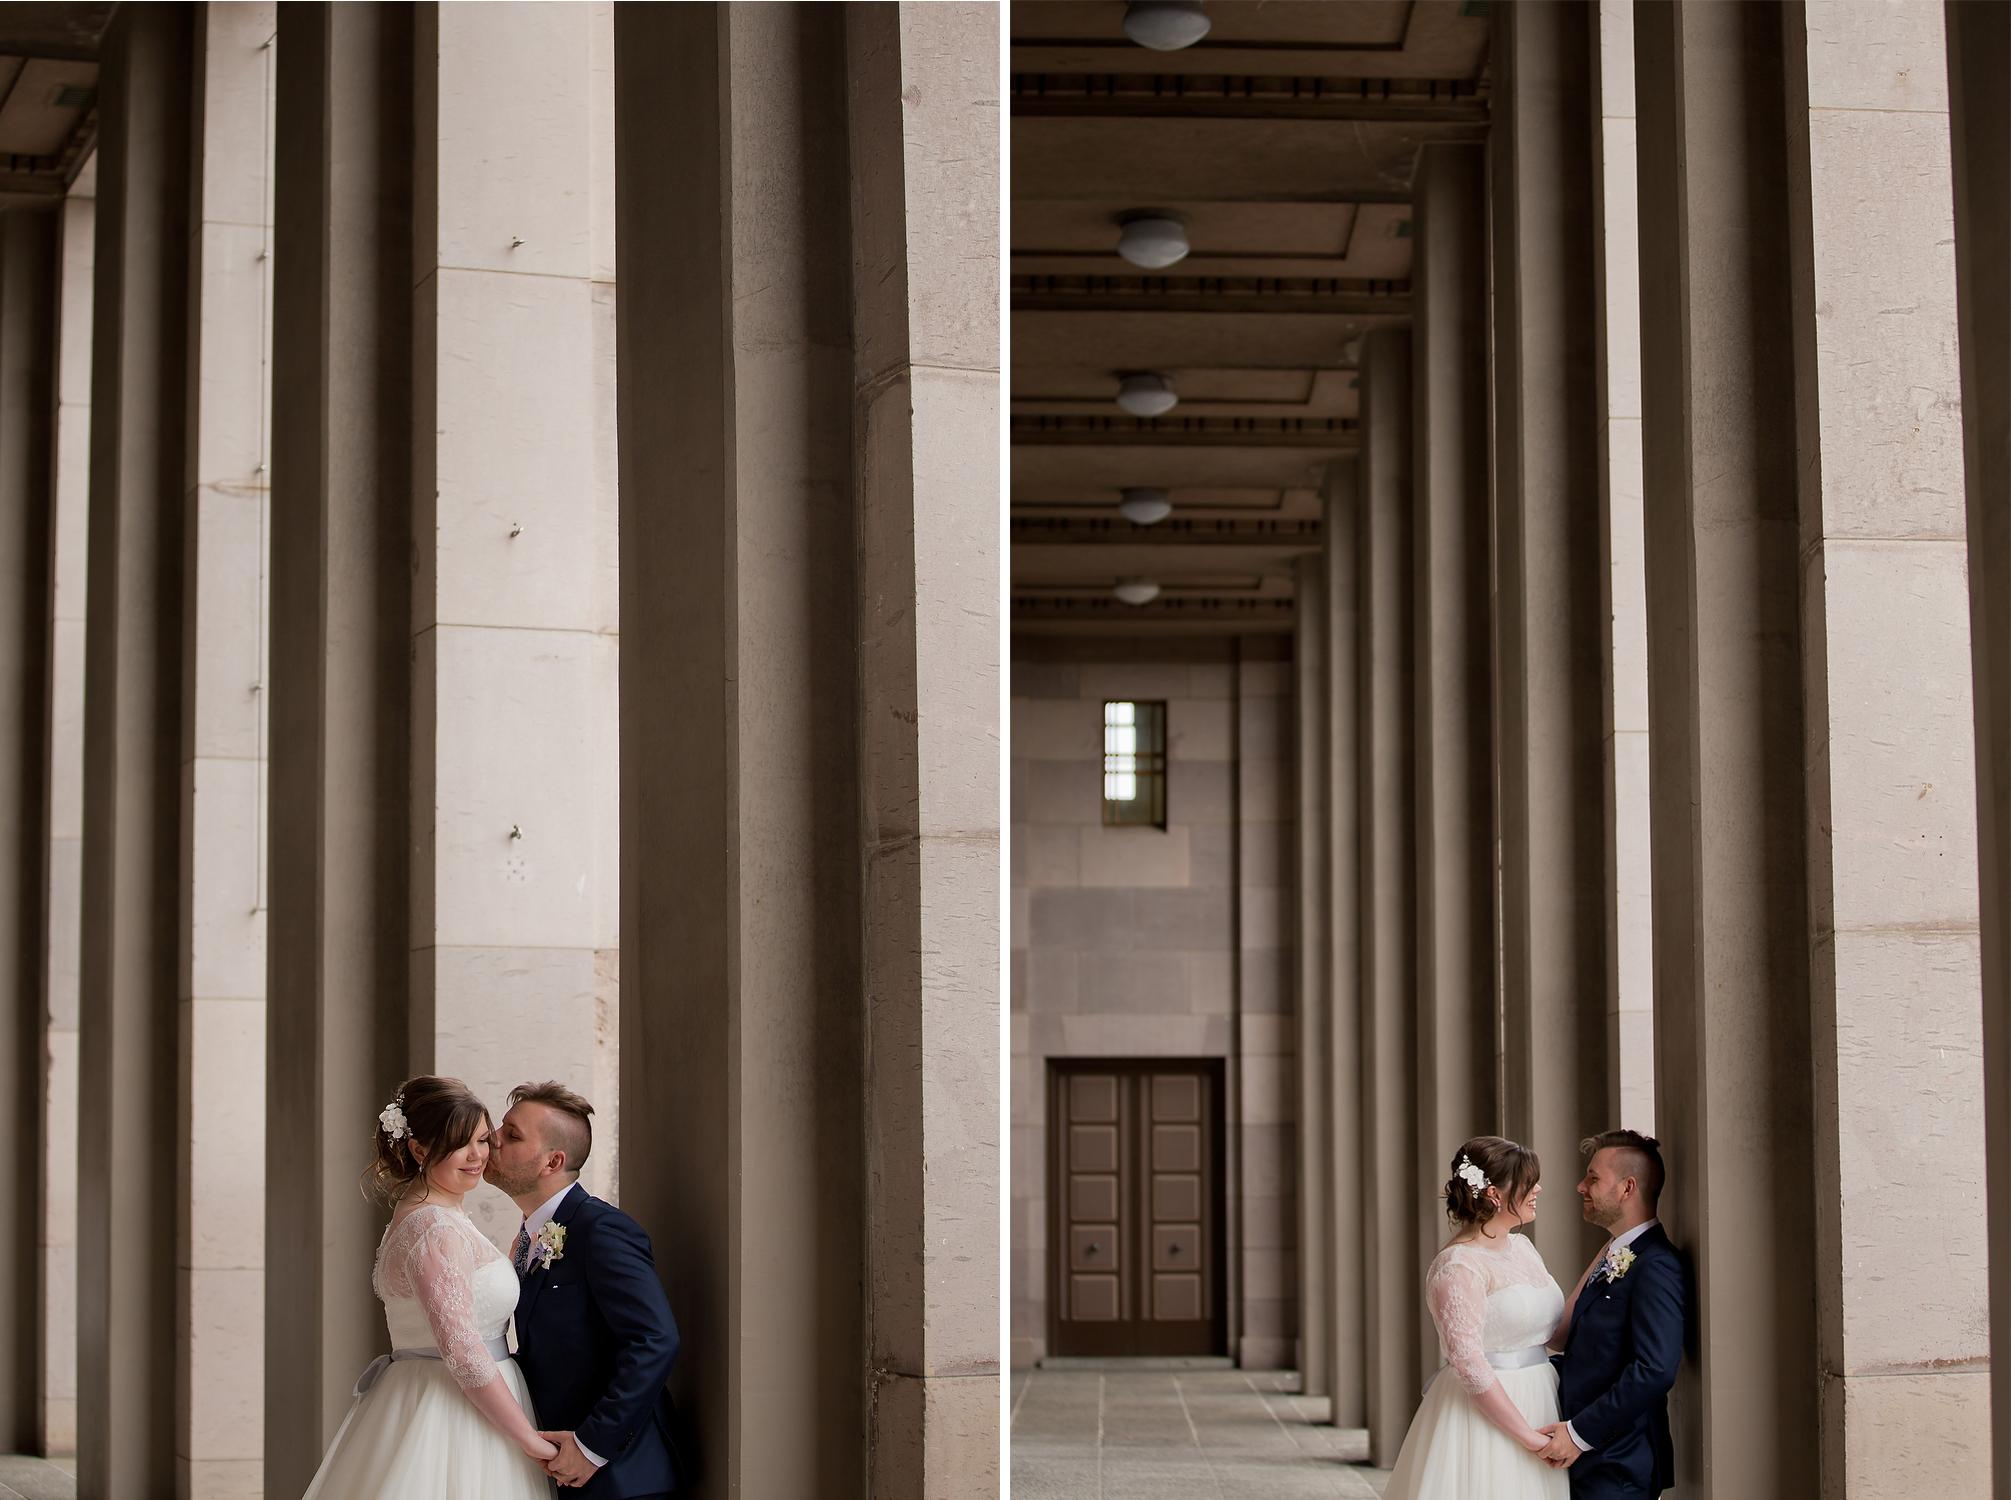 wellington wedding photography NZ - 0323.JPG